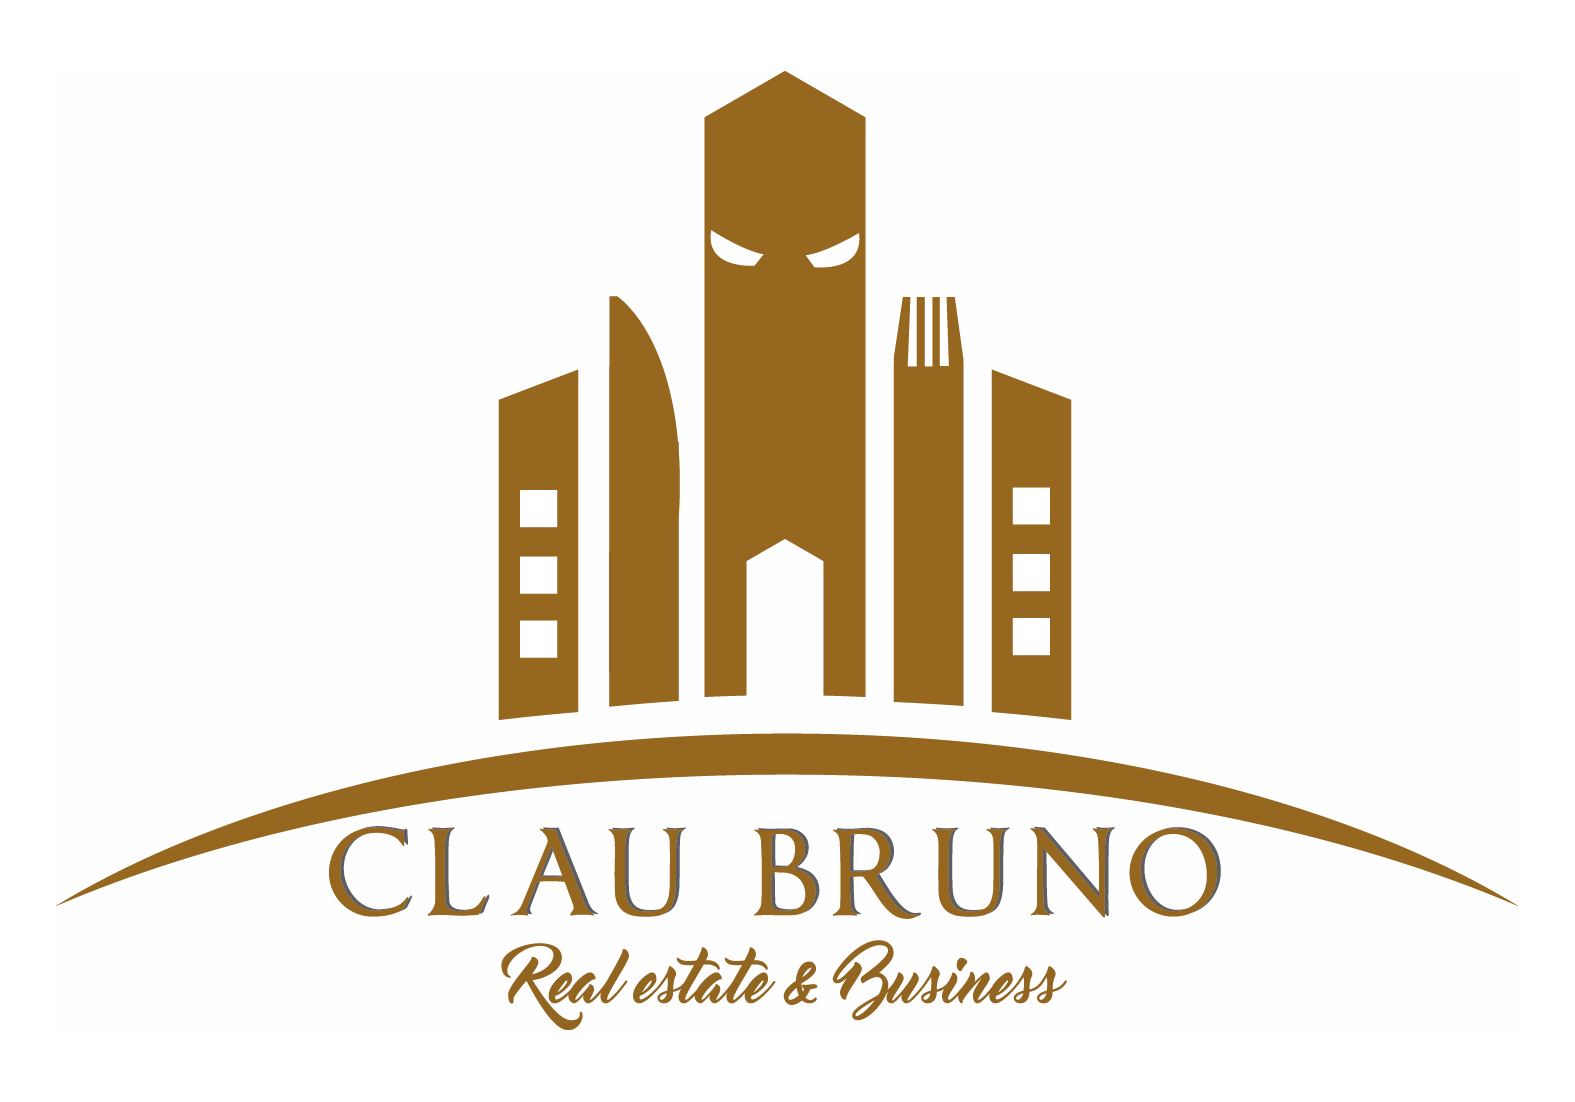 Chamberí – Se traspasa Bar/Restaurante de 280 m2